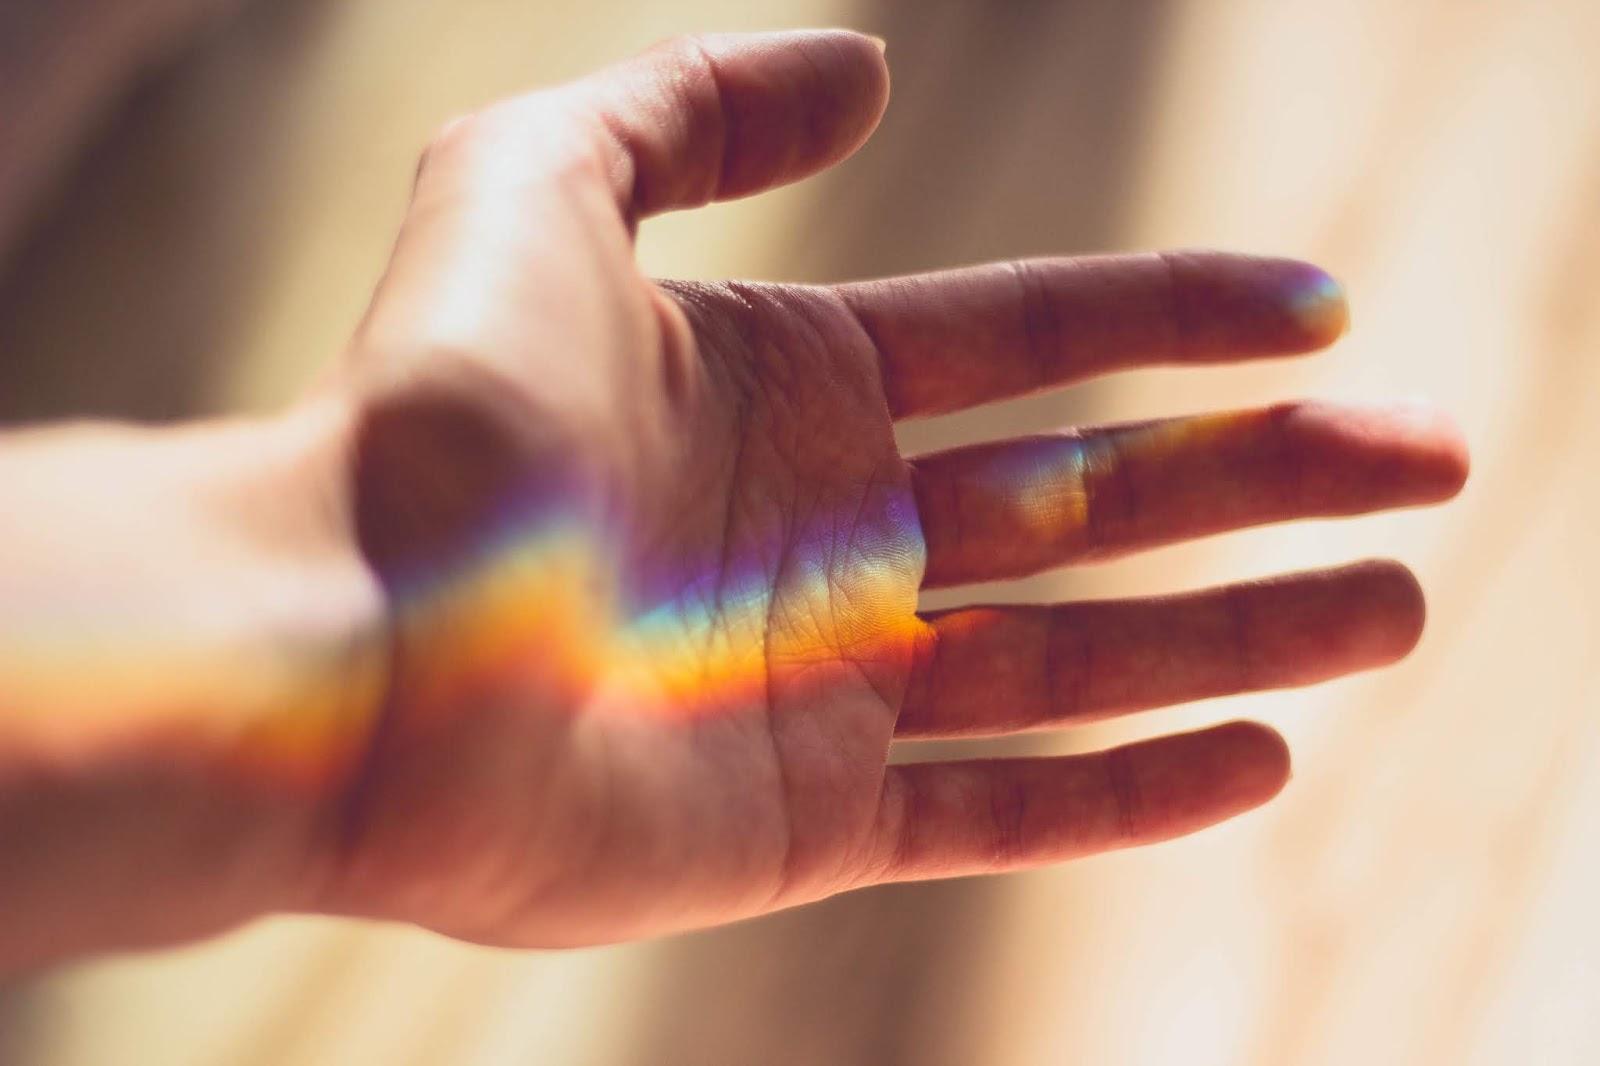 Mãos tumblr, arco íris, arquivos de rafaela